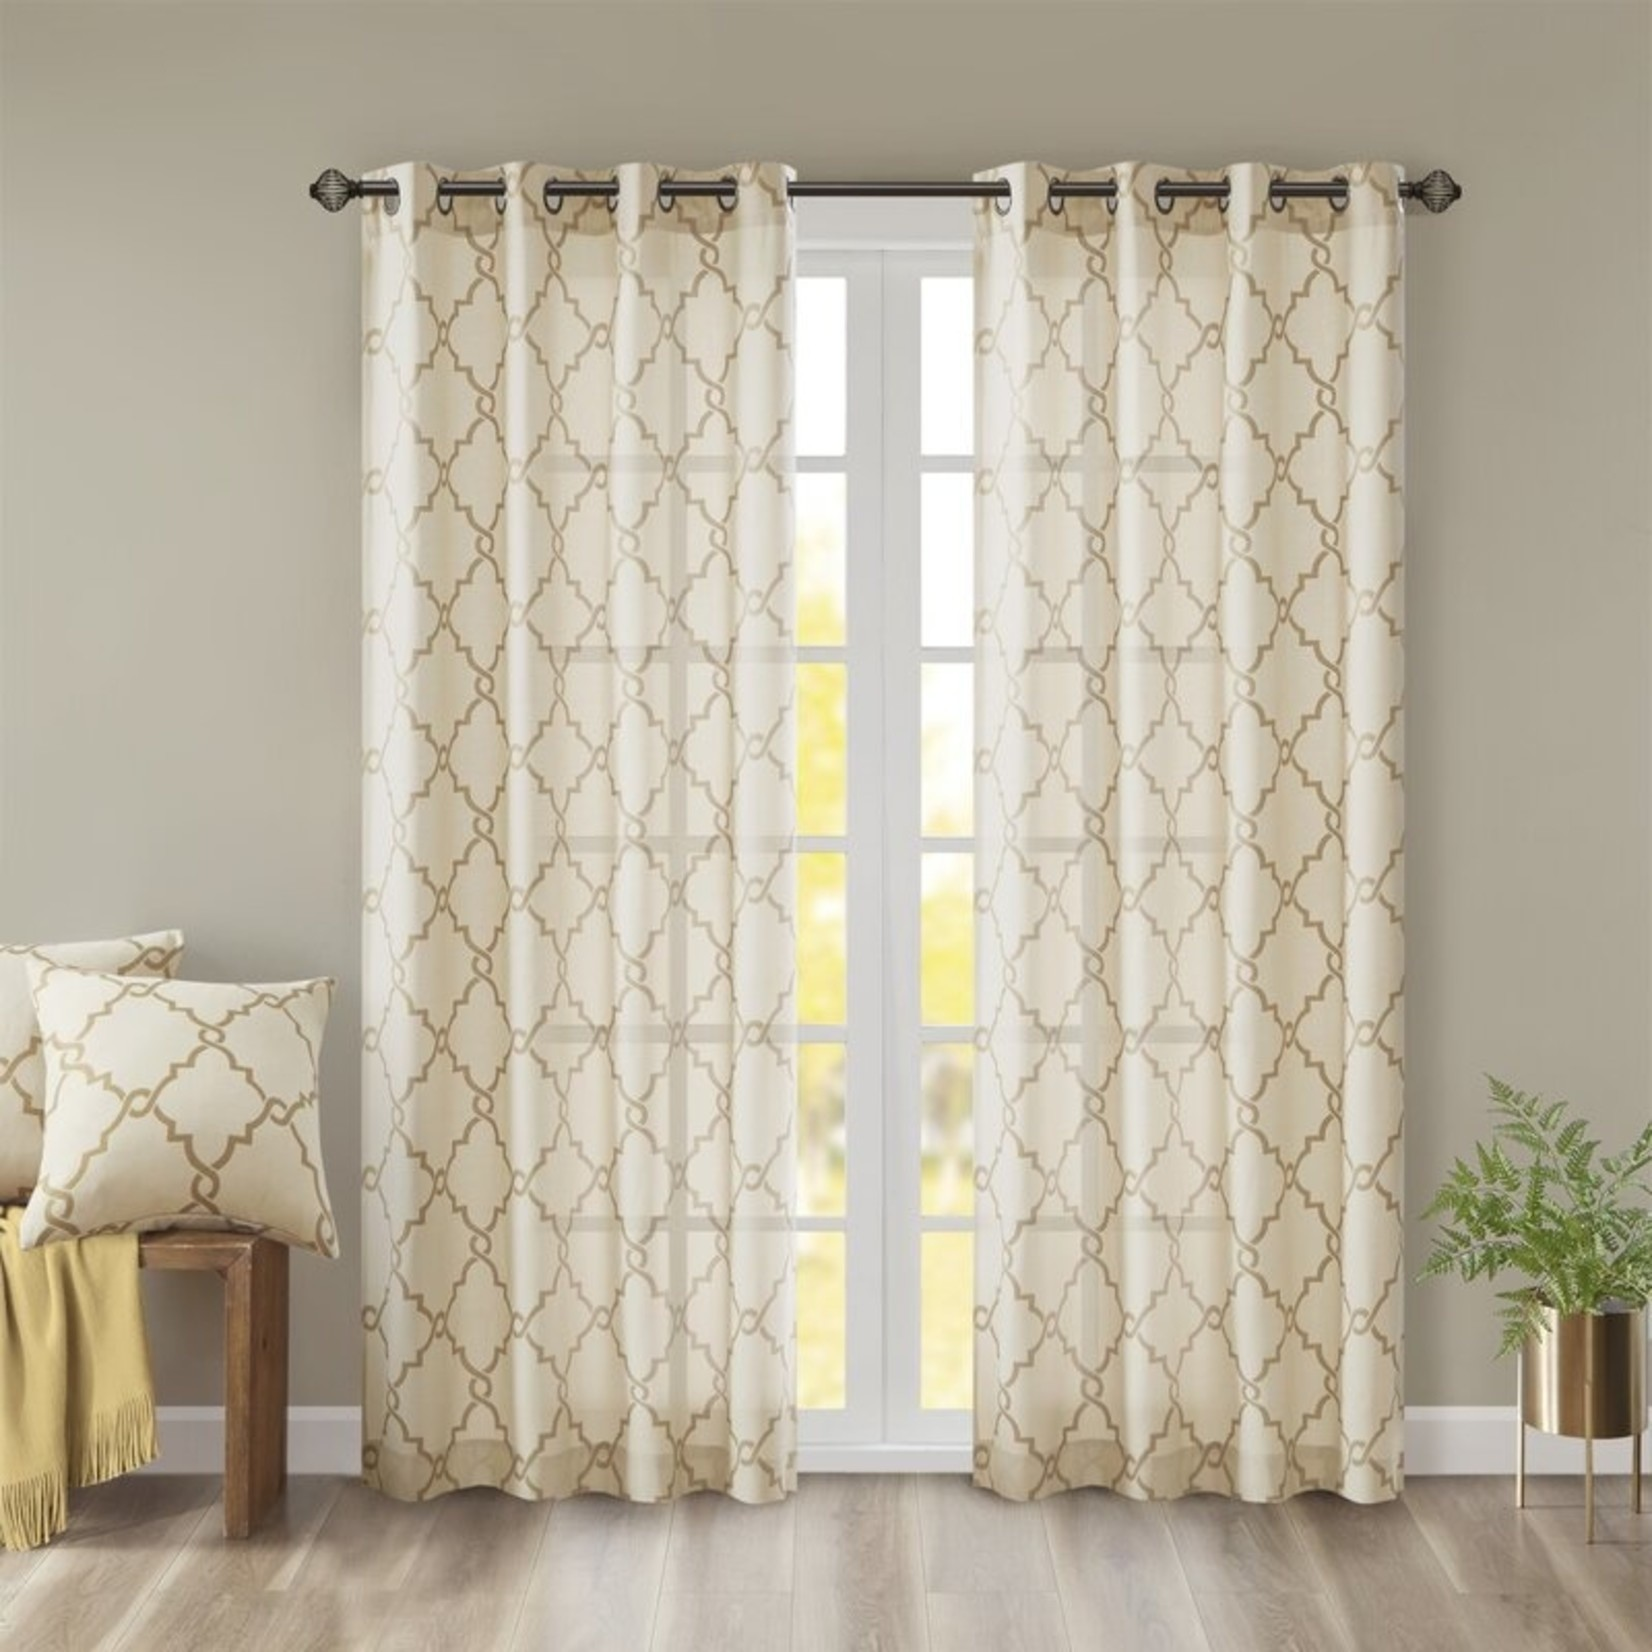 "*Winnett Geometric Semi-Sheer Grommet Curtains - 50"" x 95"" - Set of 2"